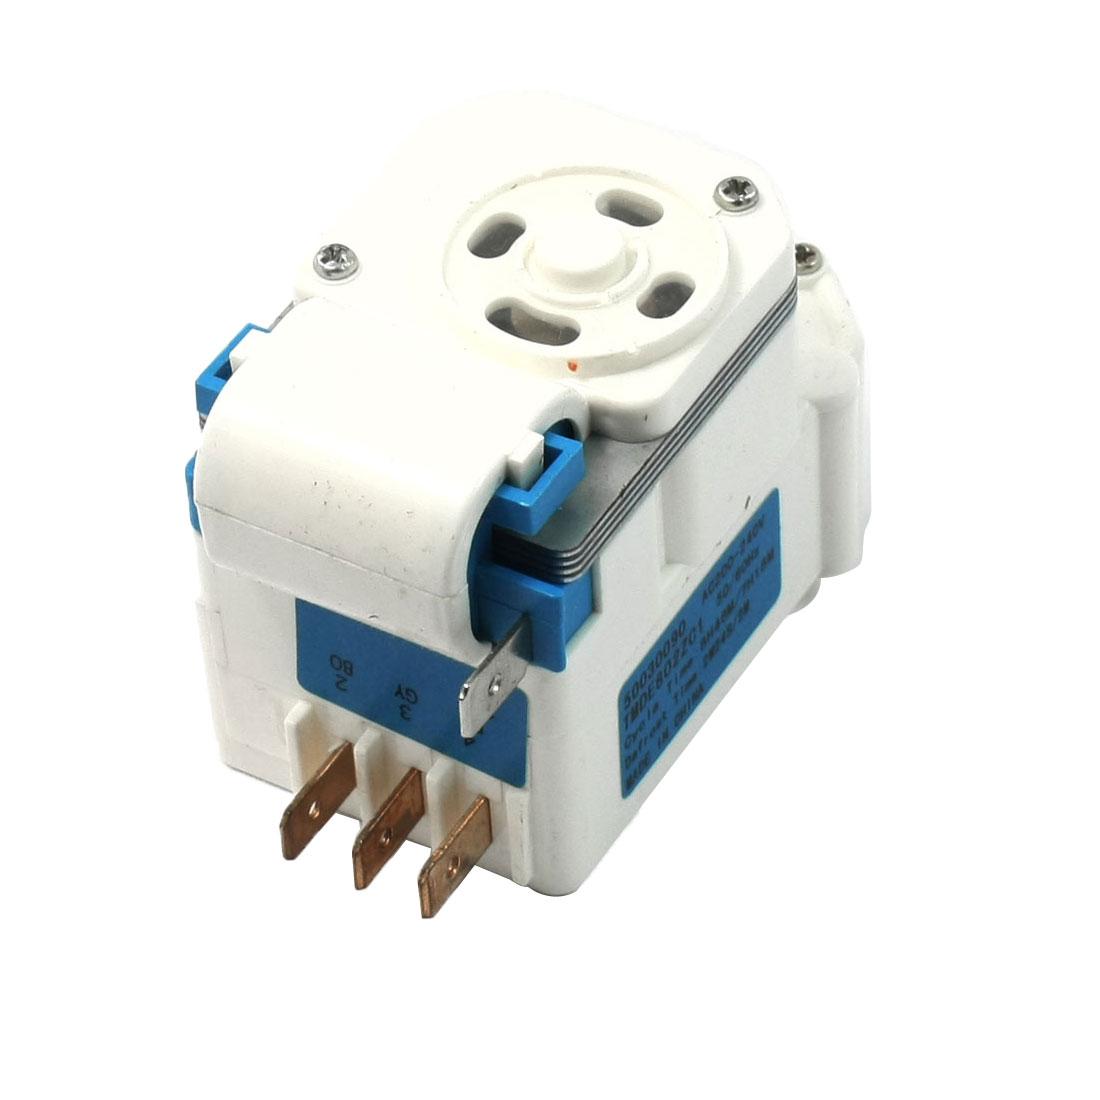 AC 200V/240V Replacing Rectangle Shaped Refrigerator Defrost Timer TMDE802ZC1